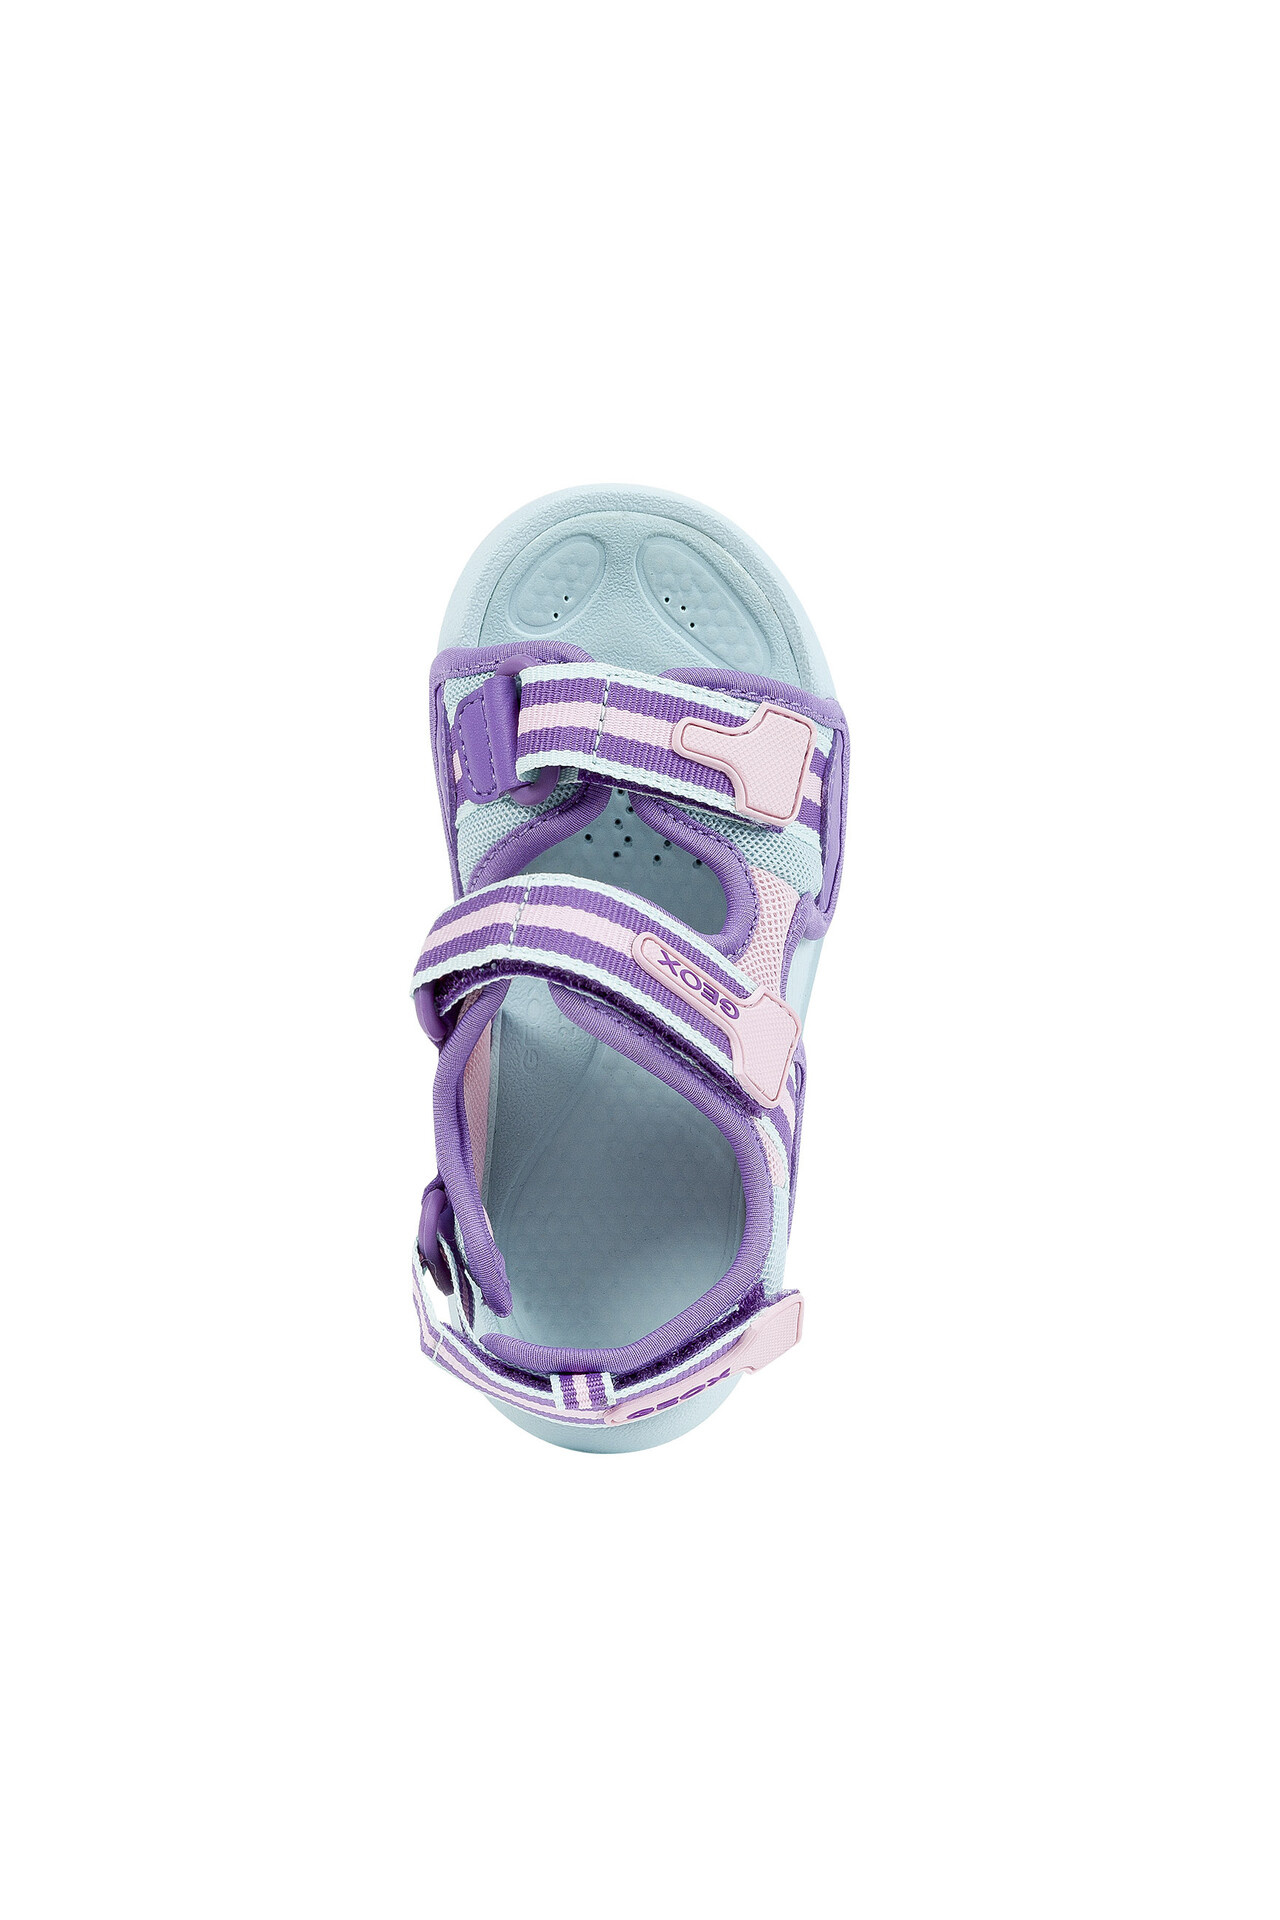 Geox Ultrak Watersea violet